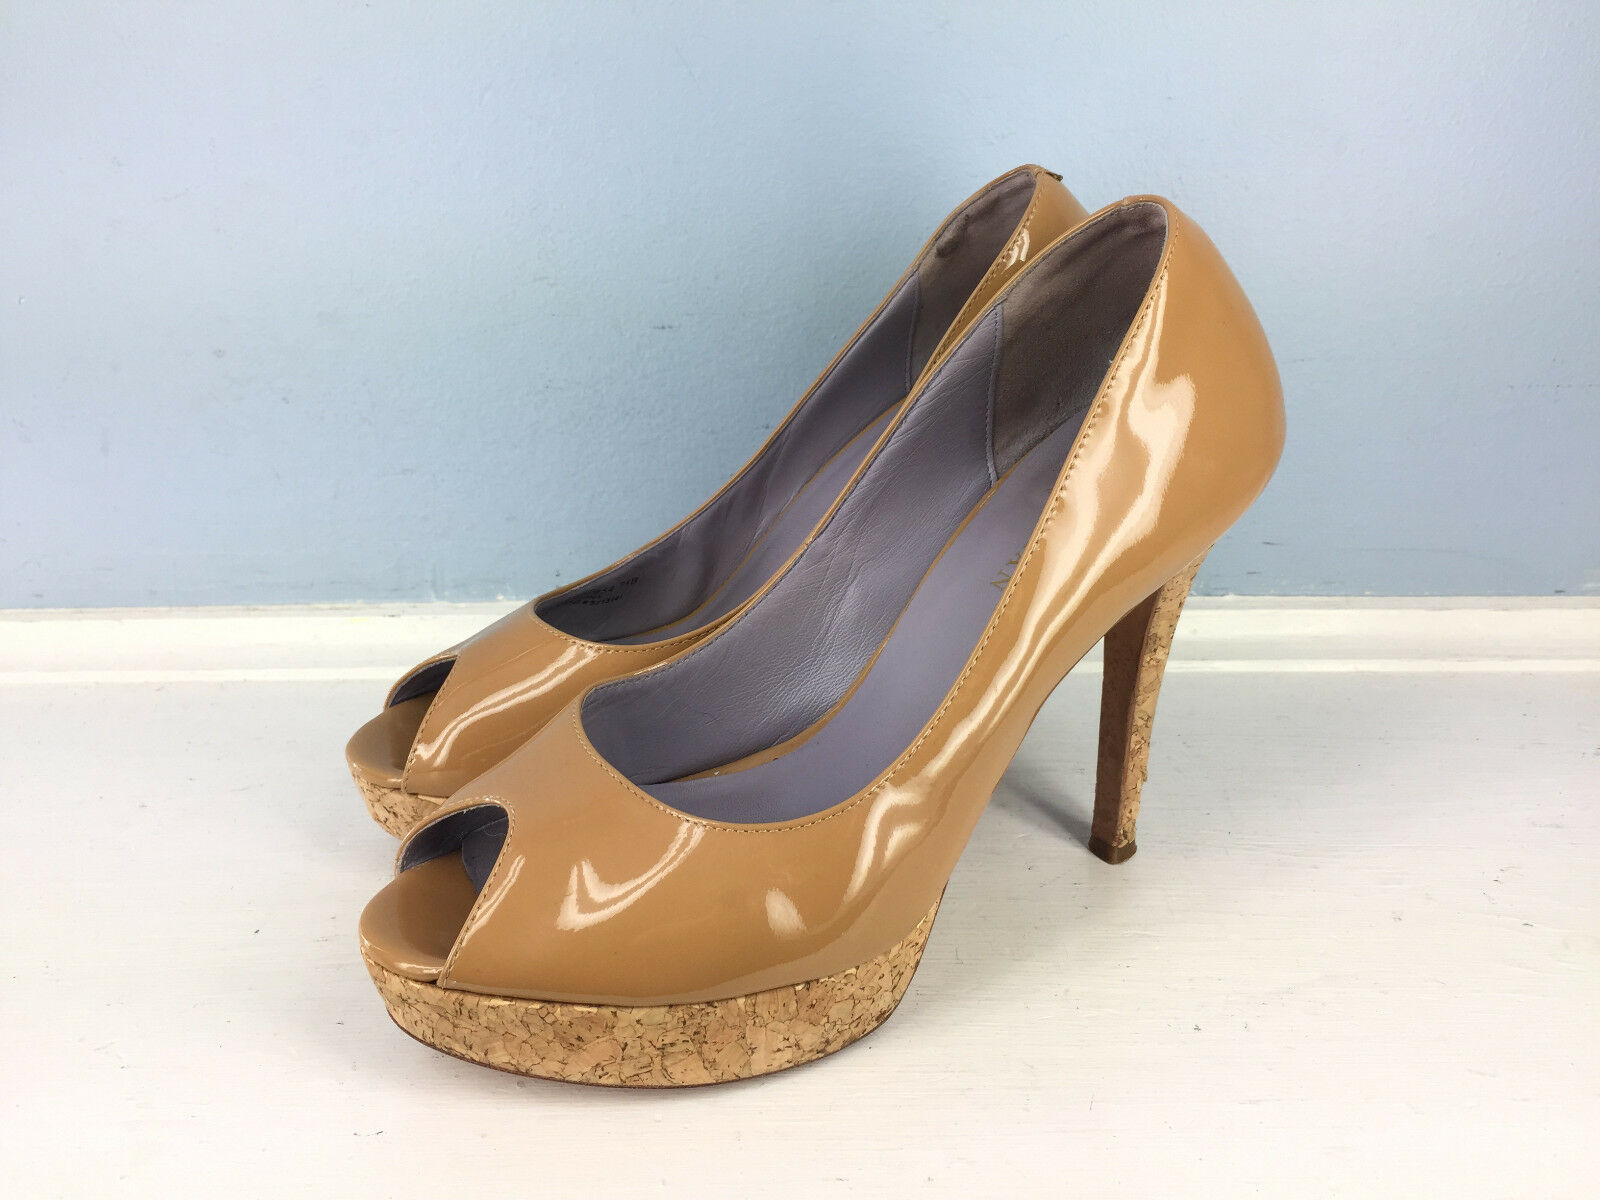 Cole Haan Braun Tan Patent Leder Peep Toe Platform heels 7.5 Career Cocktail